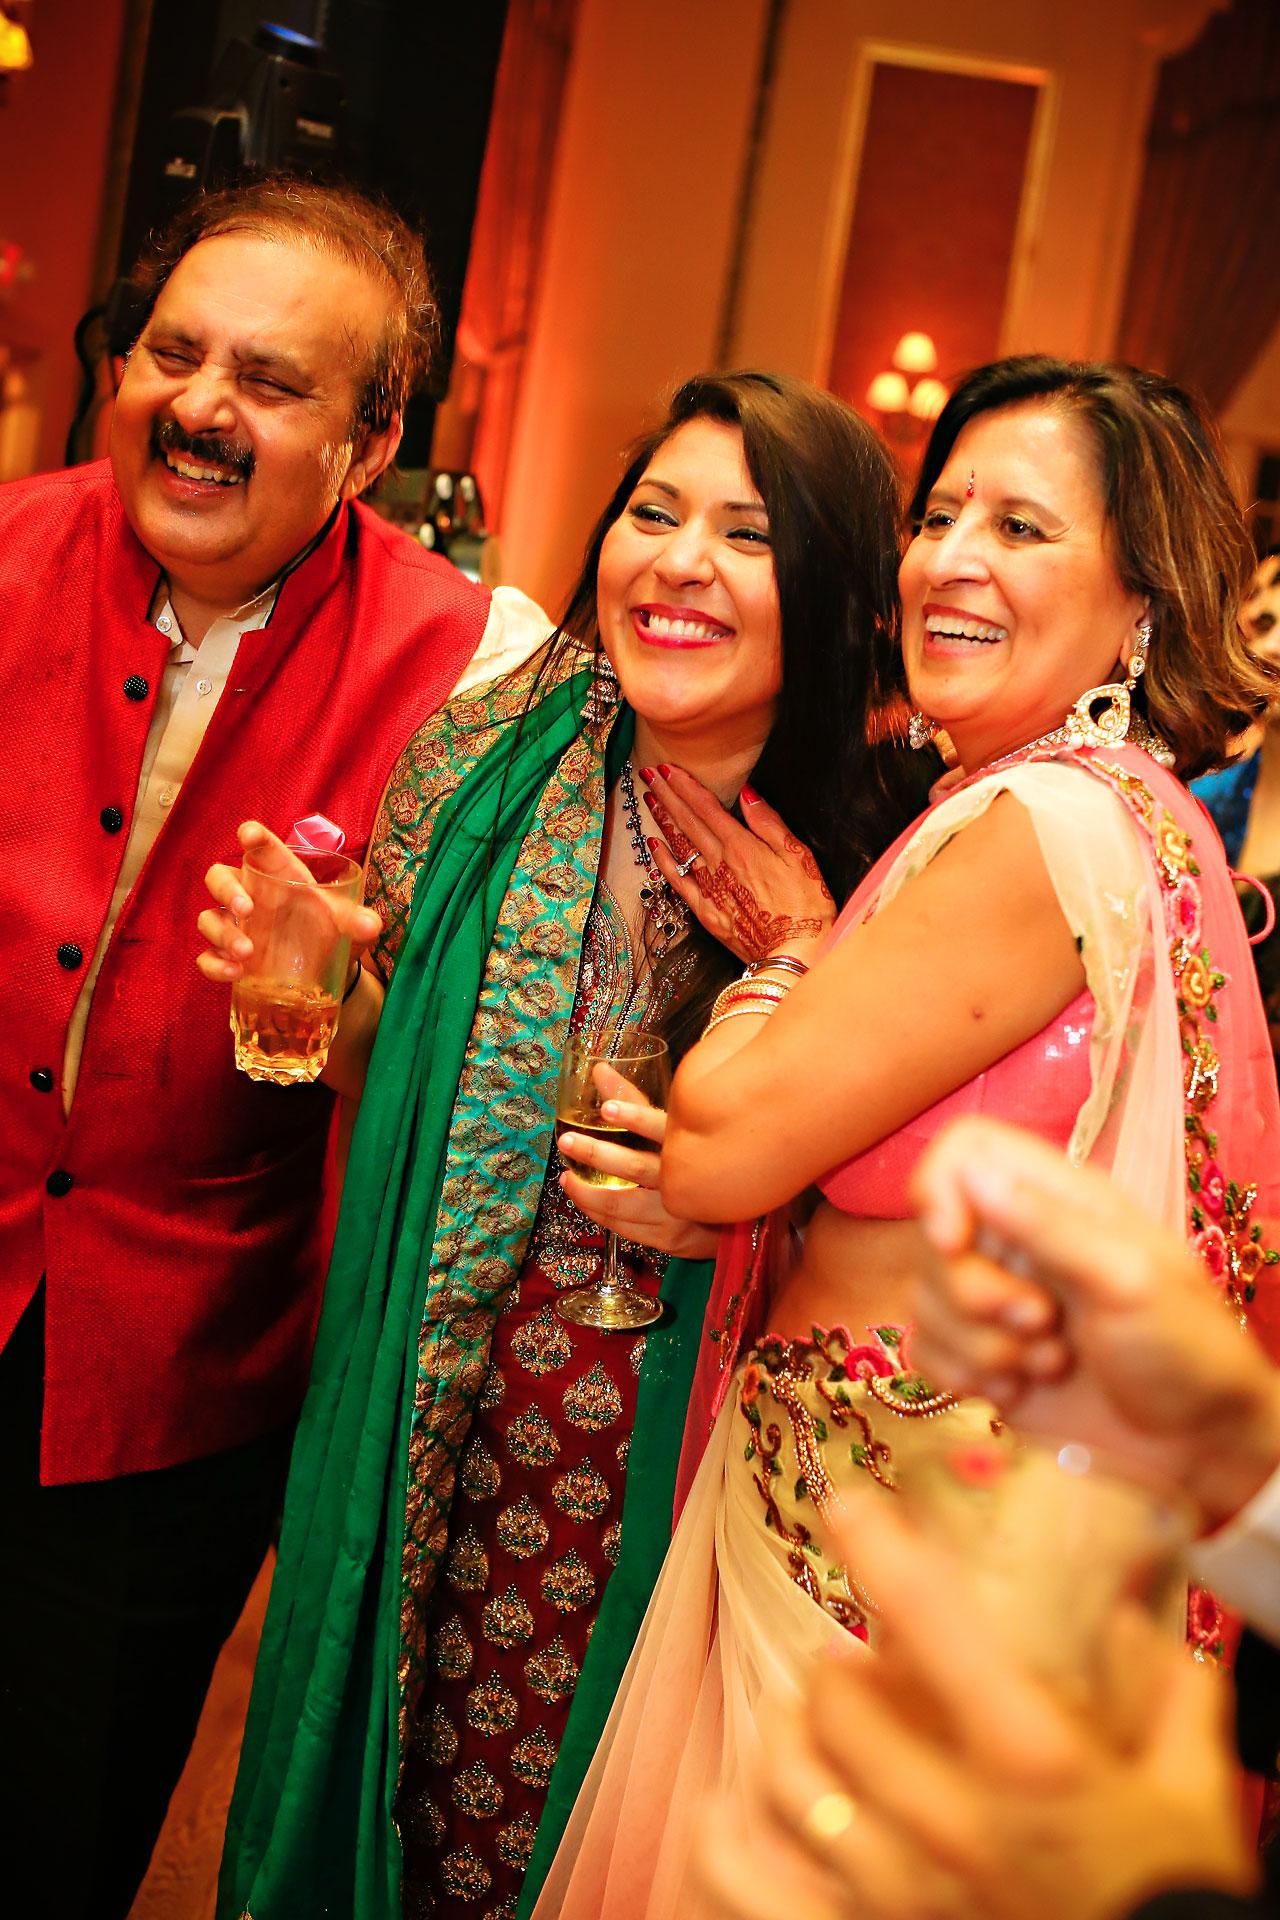 nina ryan indian wedding ceremony 477